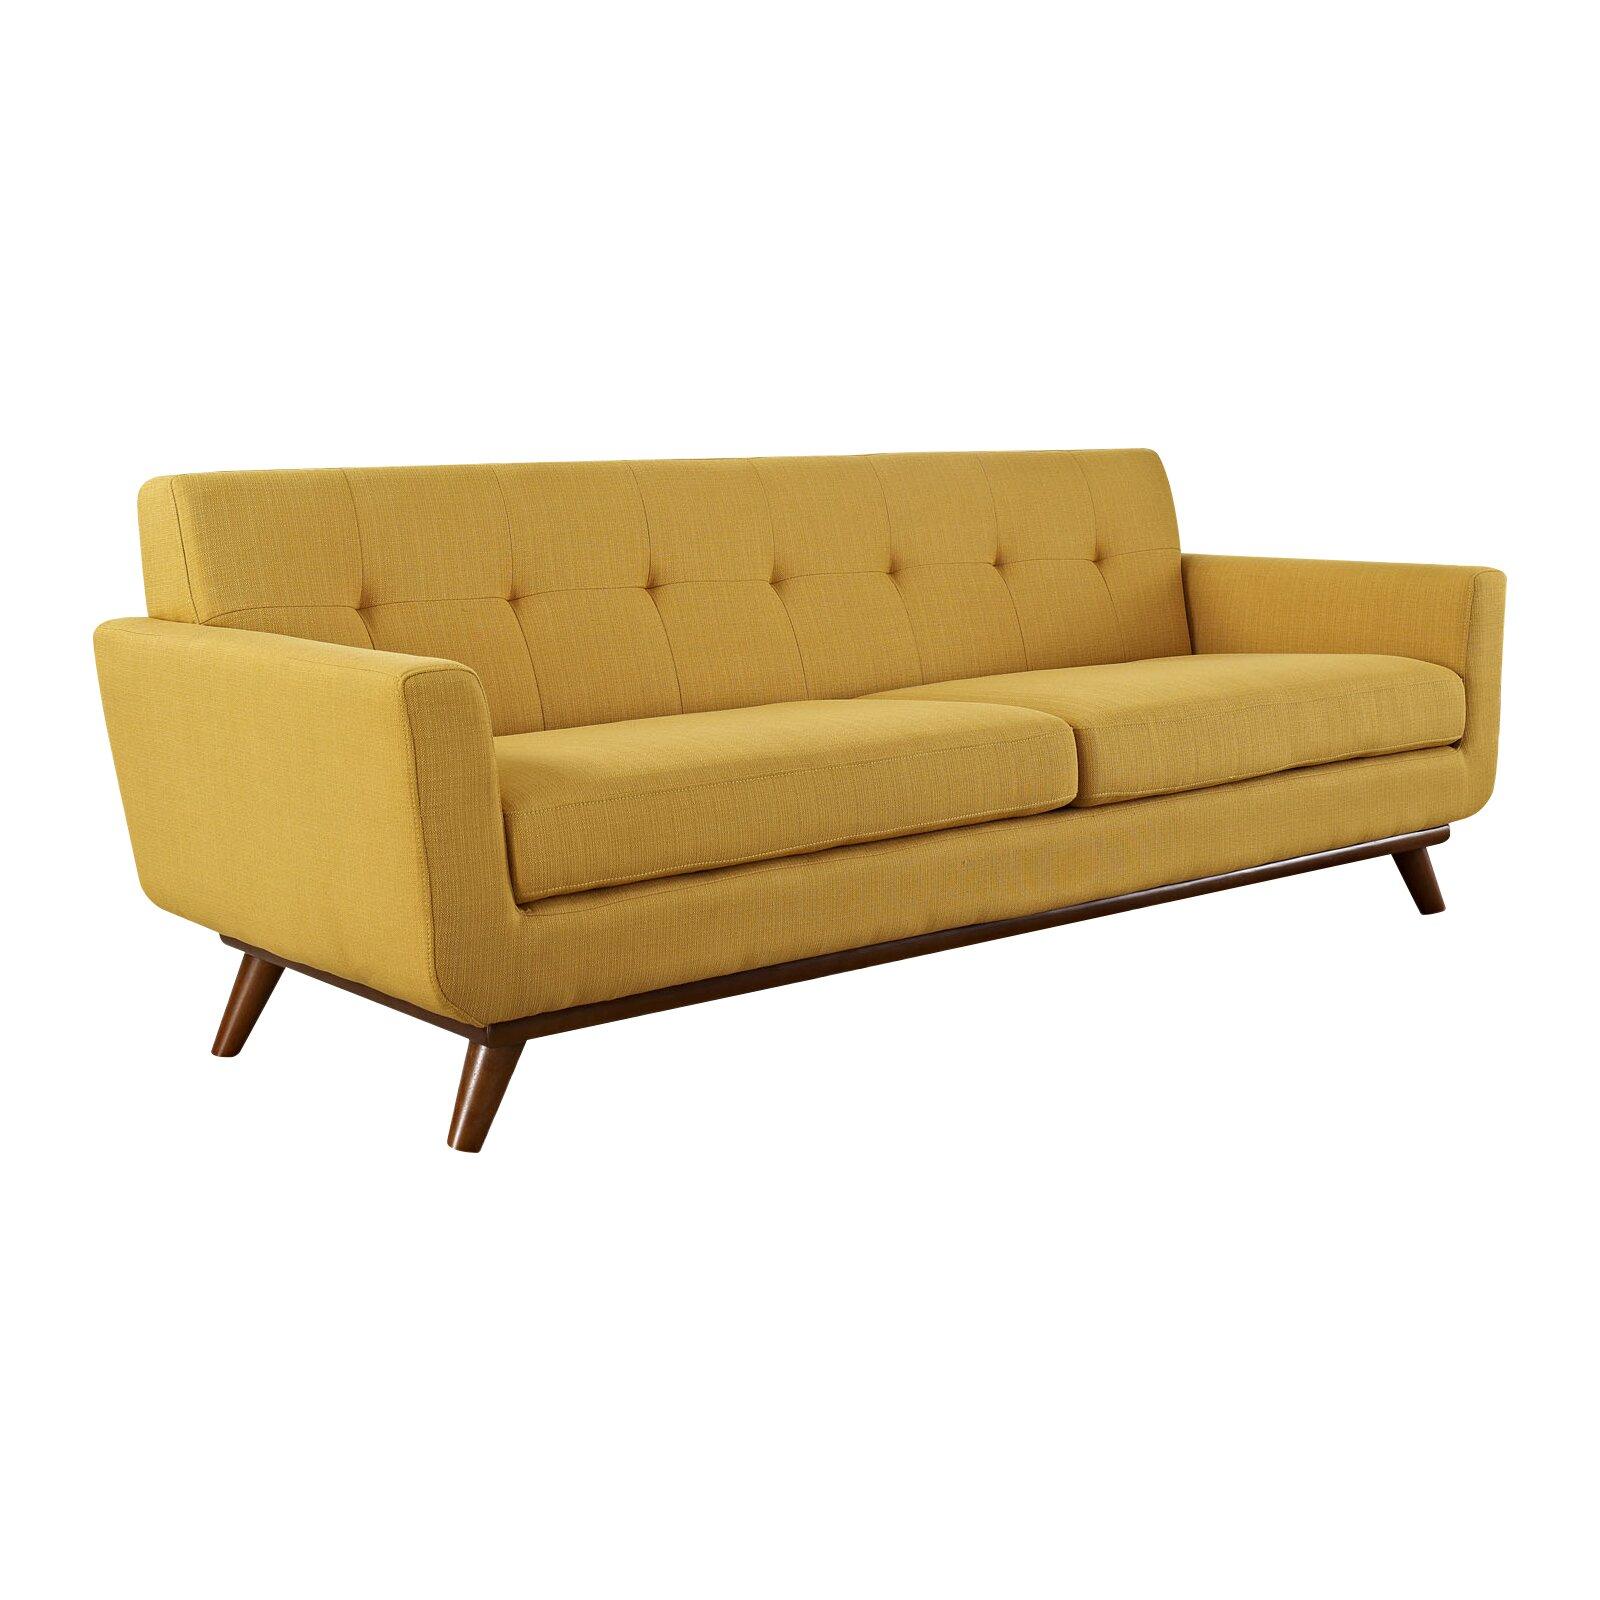 Corrigan Studio Saginaw Upholstered Sofa CSTD CSTD